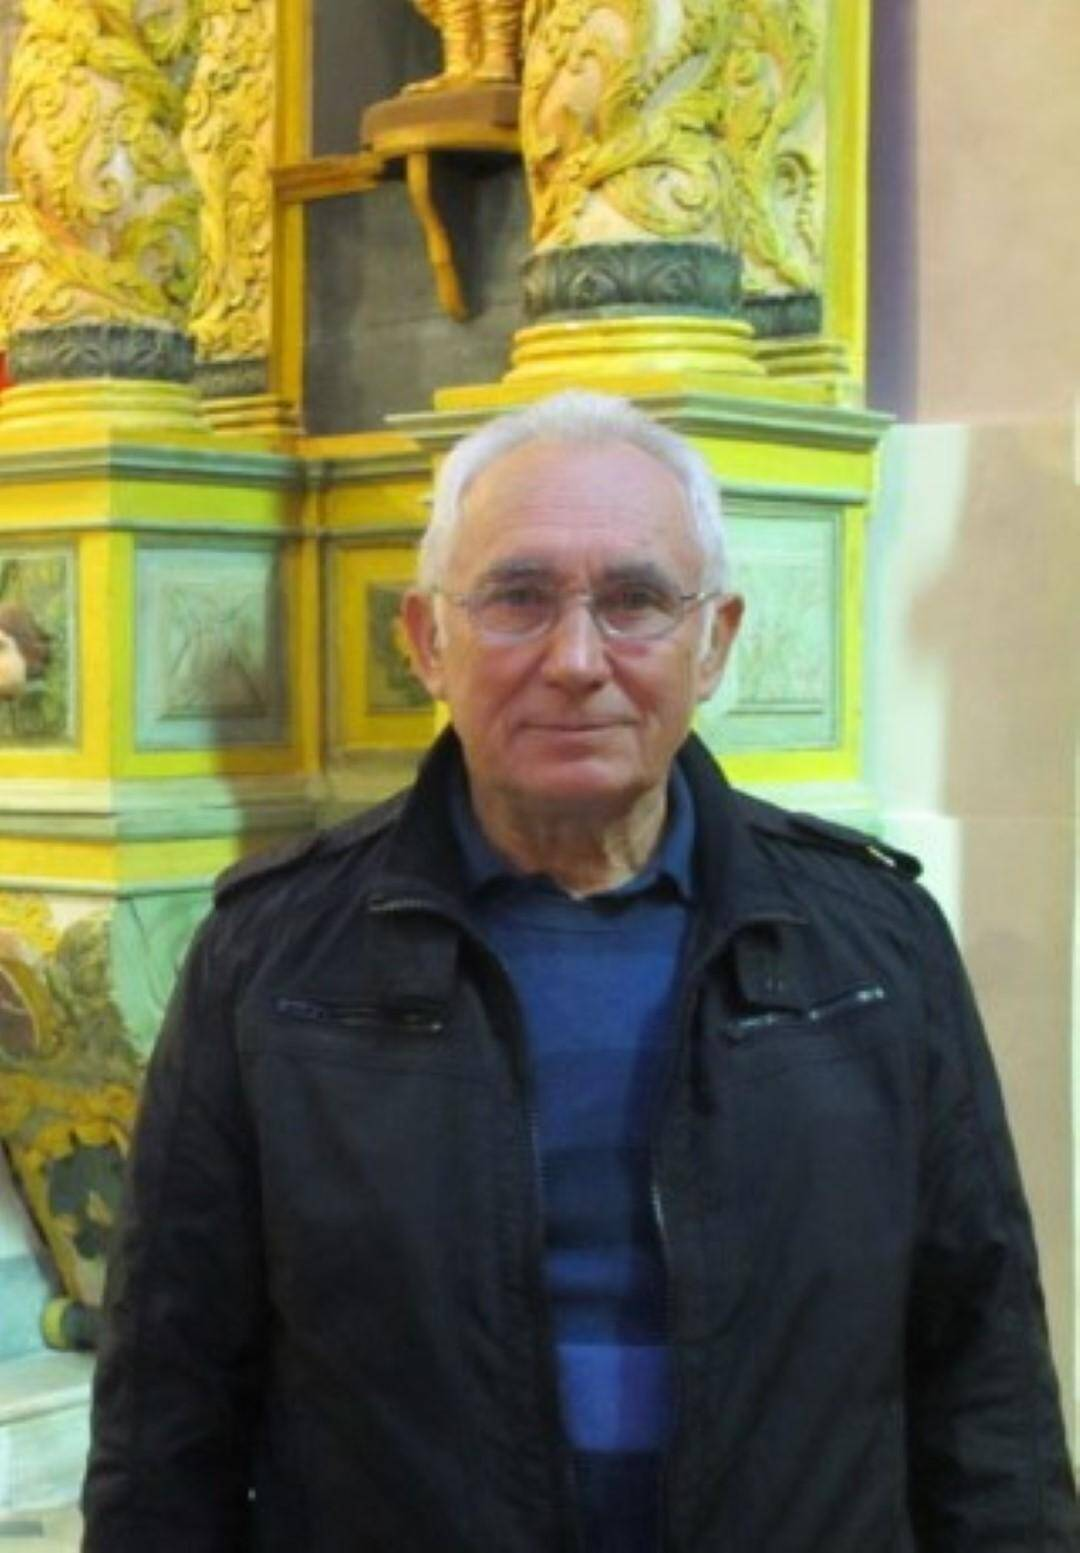 Jean-Yves Moscone, passionné et volontaire.